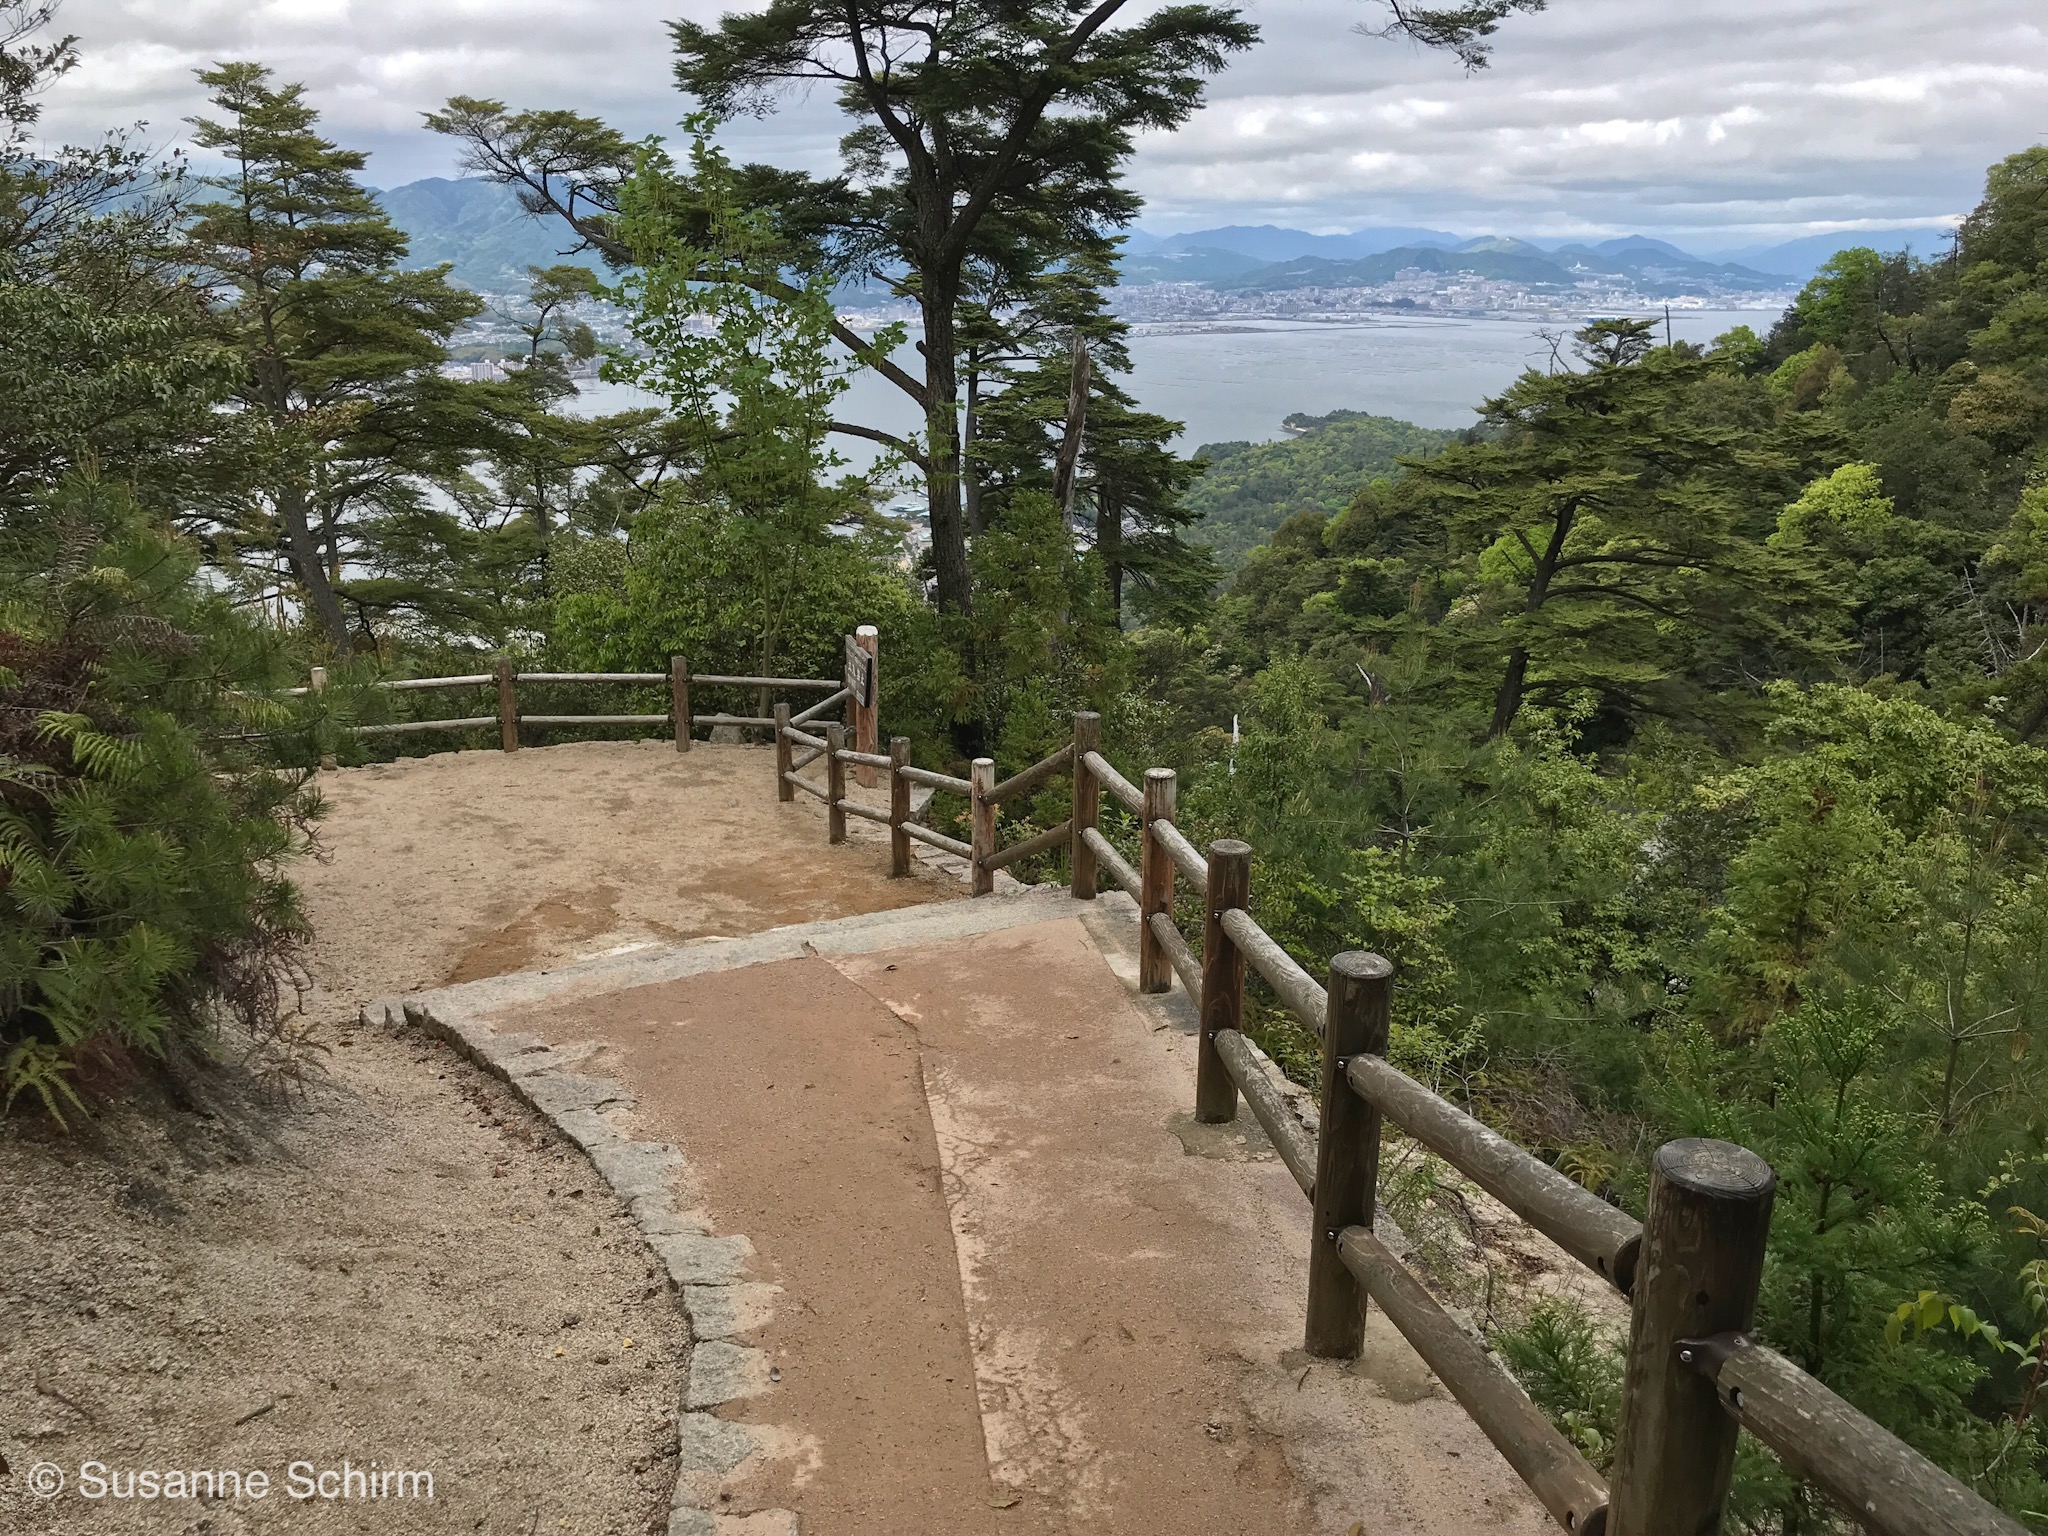 Wanderweg auf der Insel Miyajima